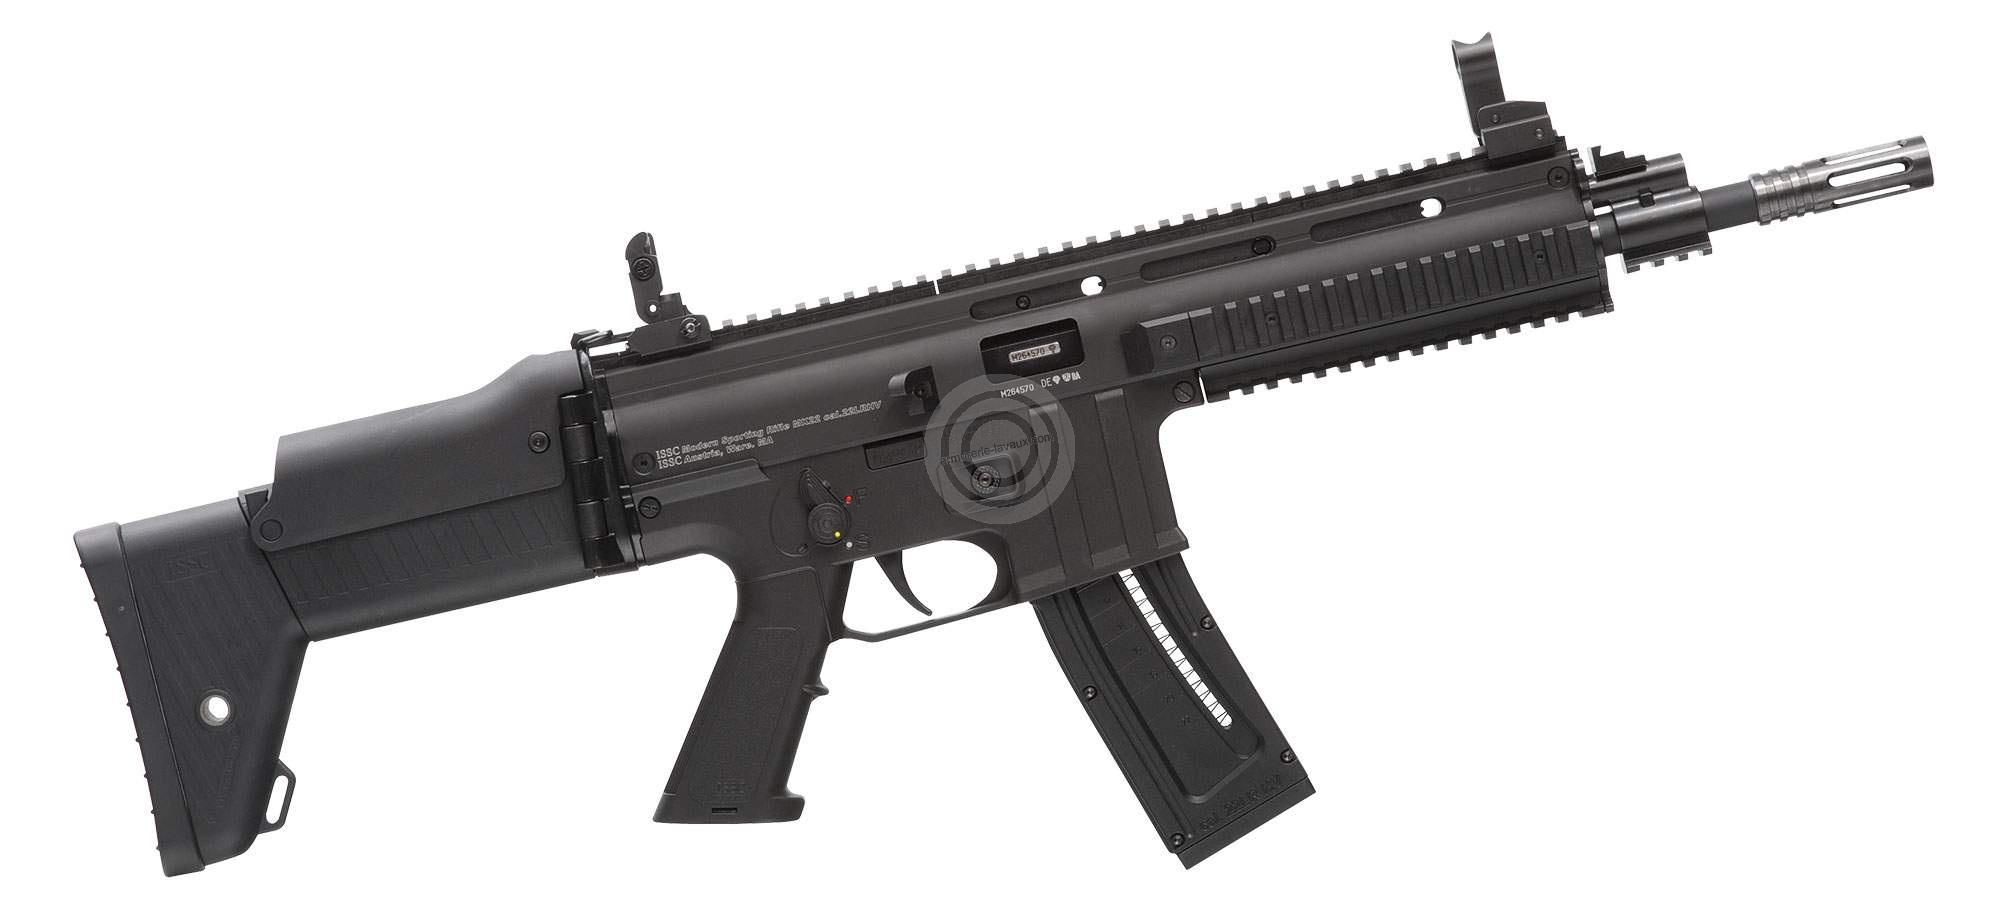 "Carabine semi-automatique ISSC MSR MK22 Commando 12"" Bronzé cal.22 Lr"